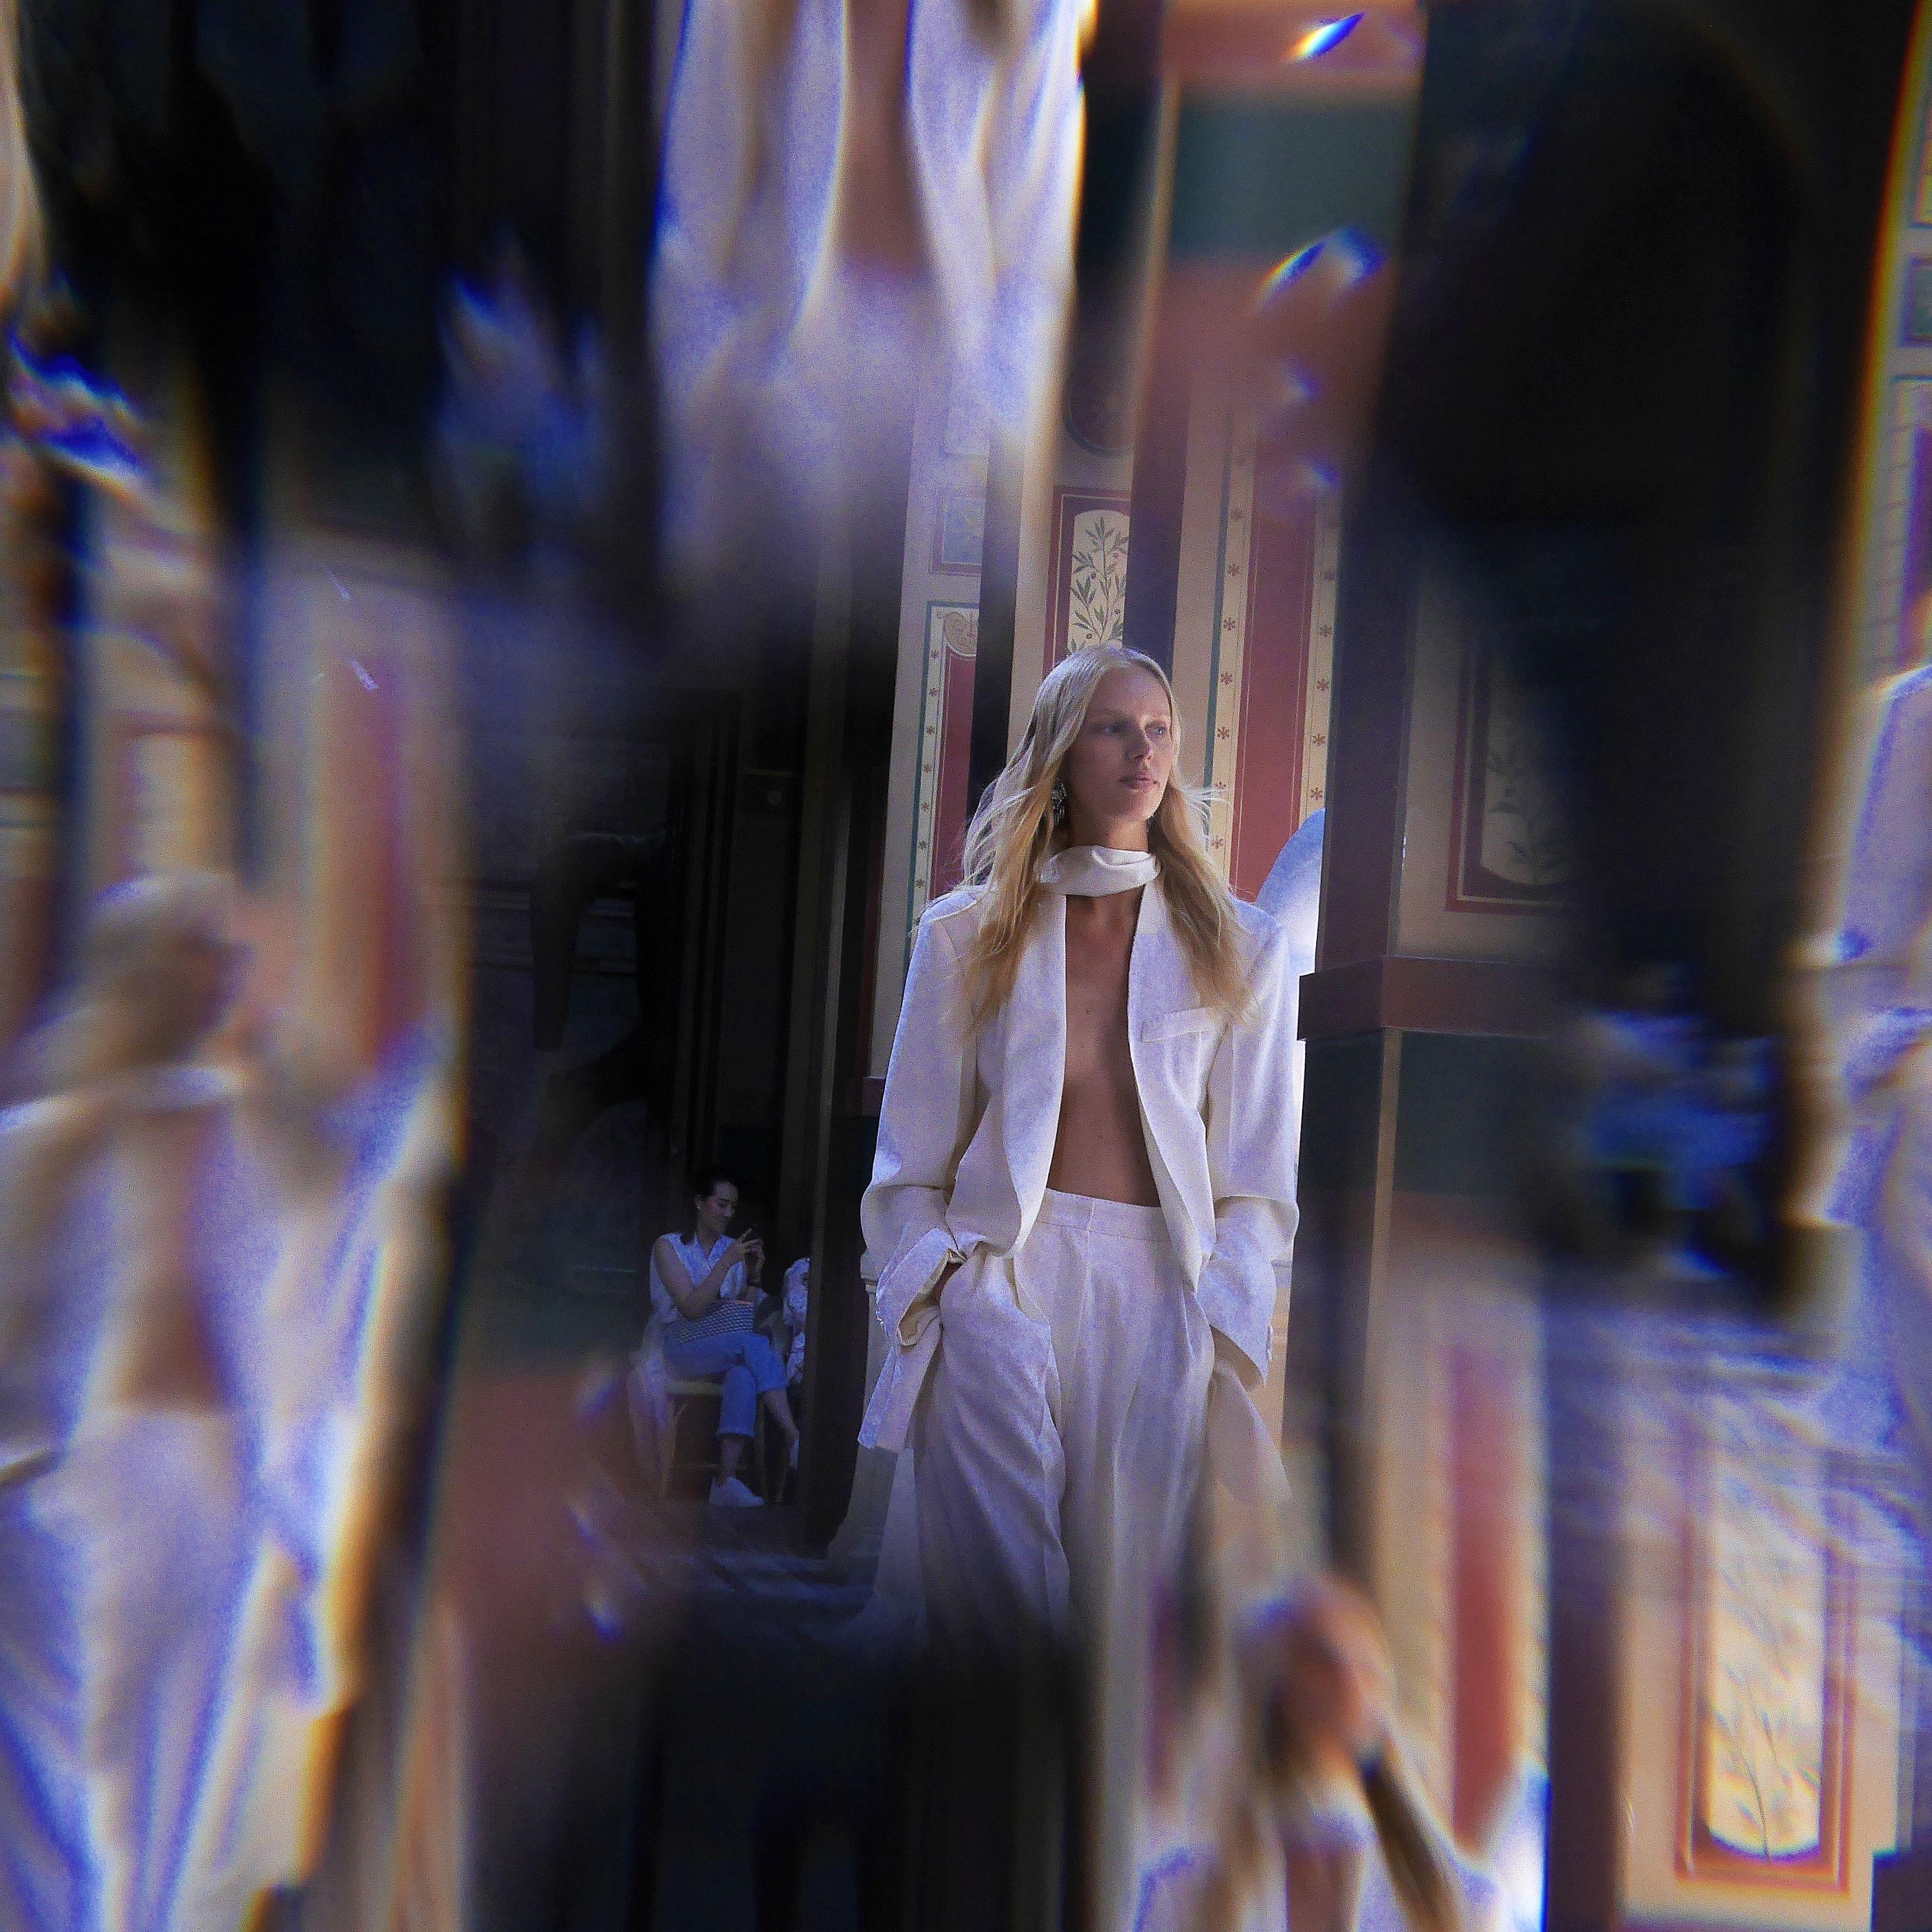 Frank_Perrin_Rykiel_Atelier_2018_1560443-Exposure